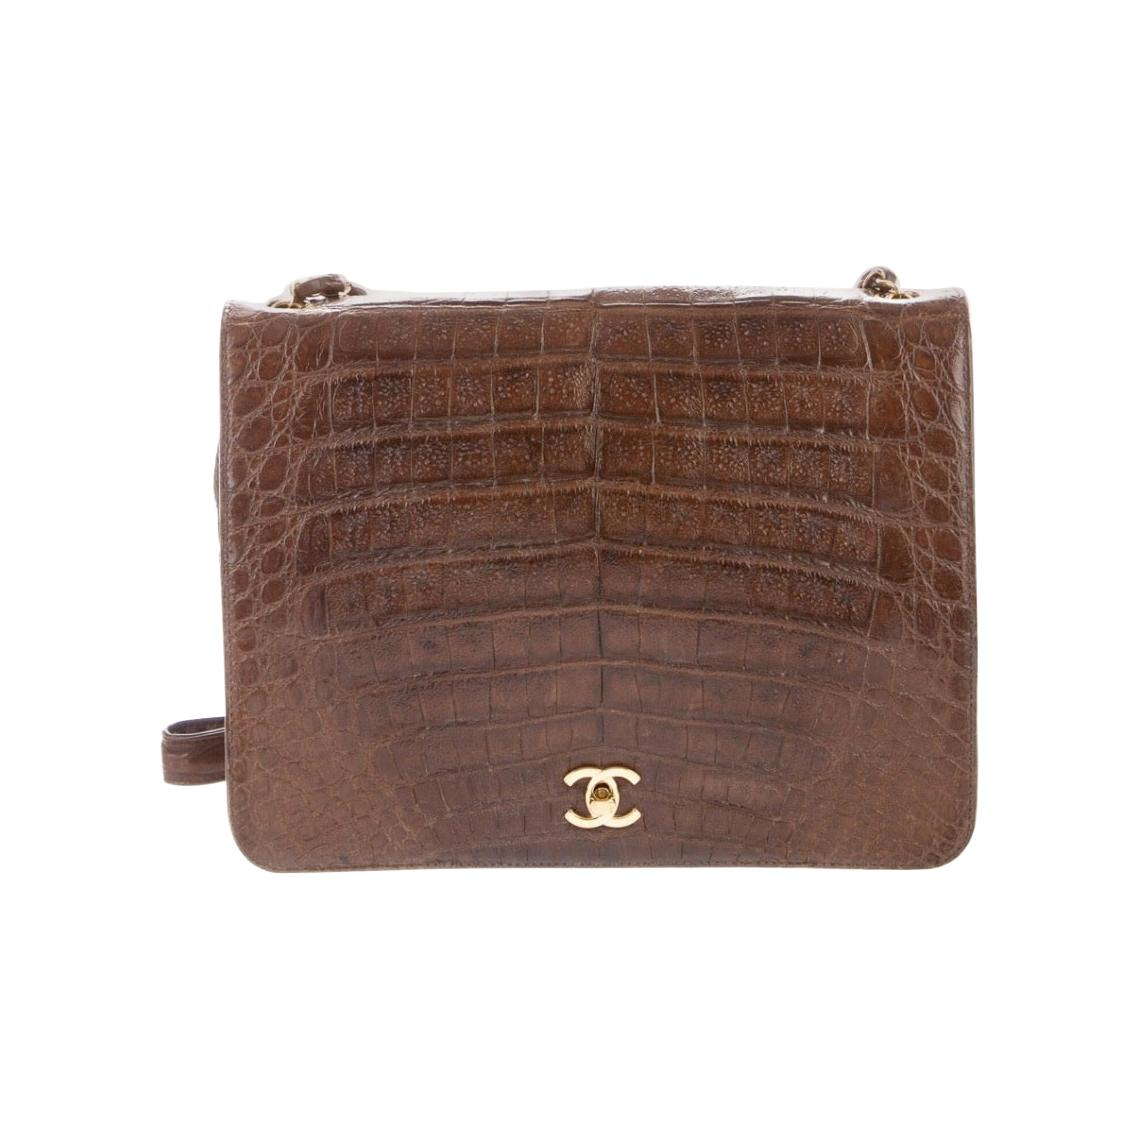 Chanel Vintage Dark Brown Cognac Crocodile Exotic Gold Medium Shoulder Flap Bag